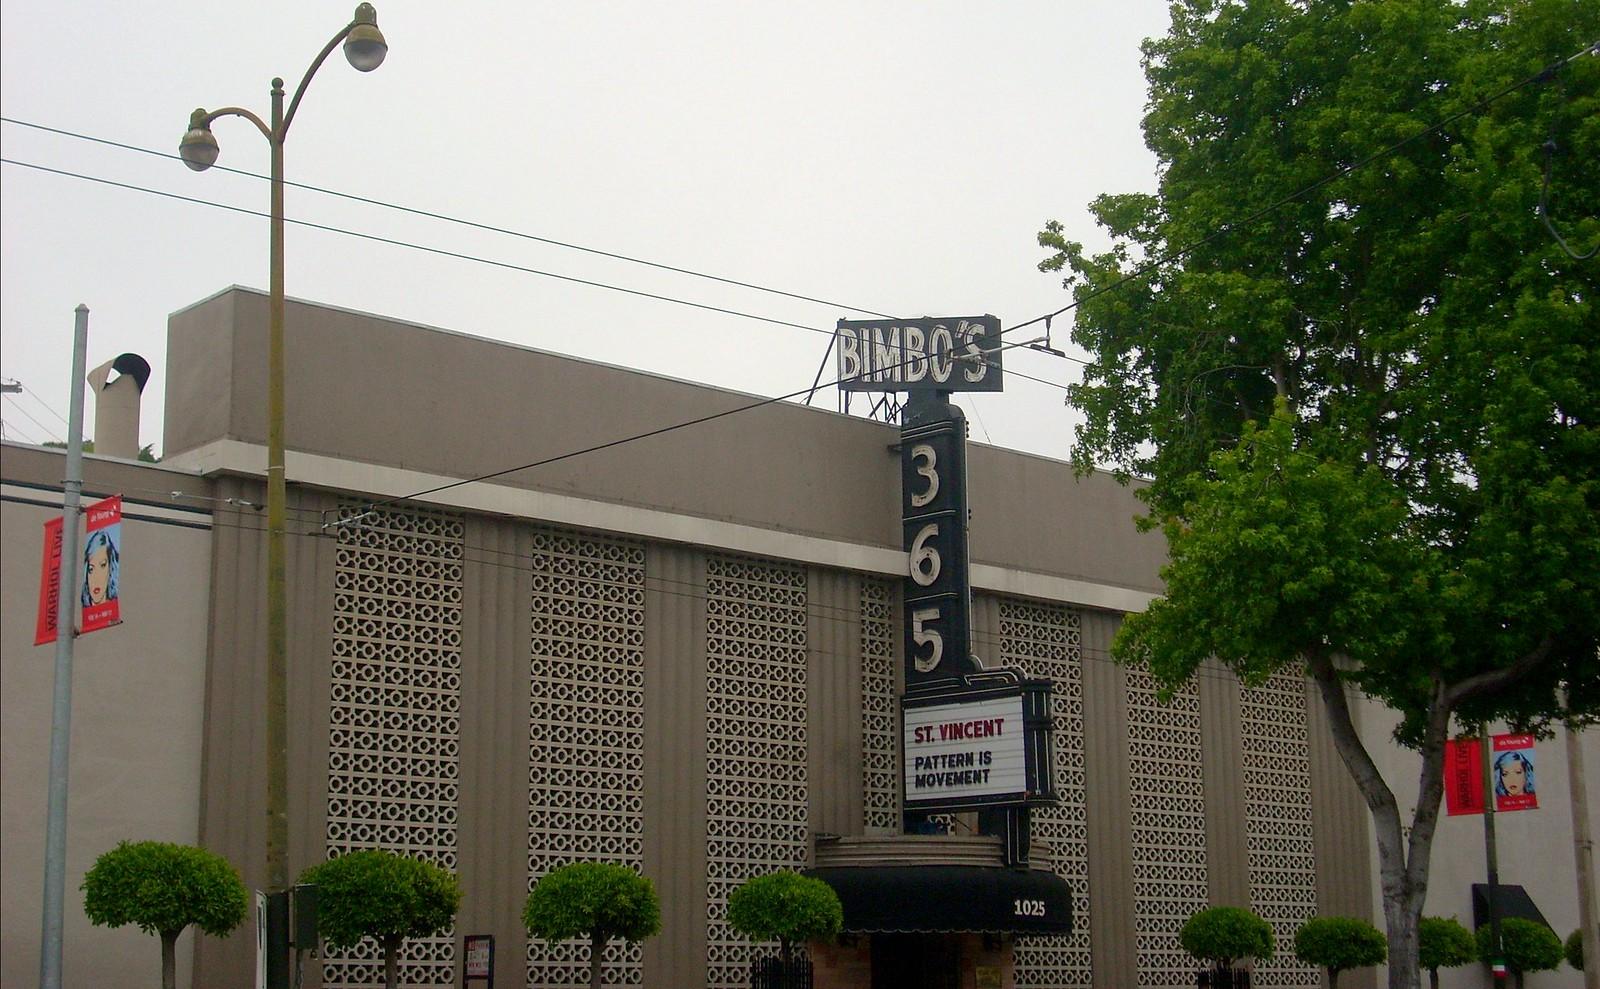 Bimbo's 365 Club, San Francisco, Ca.